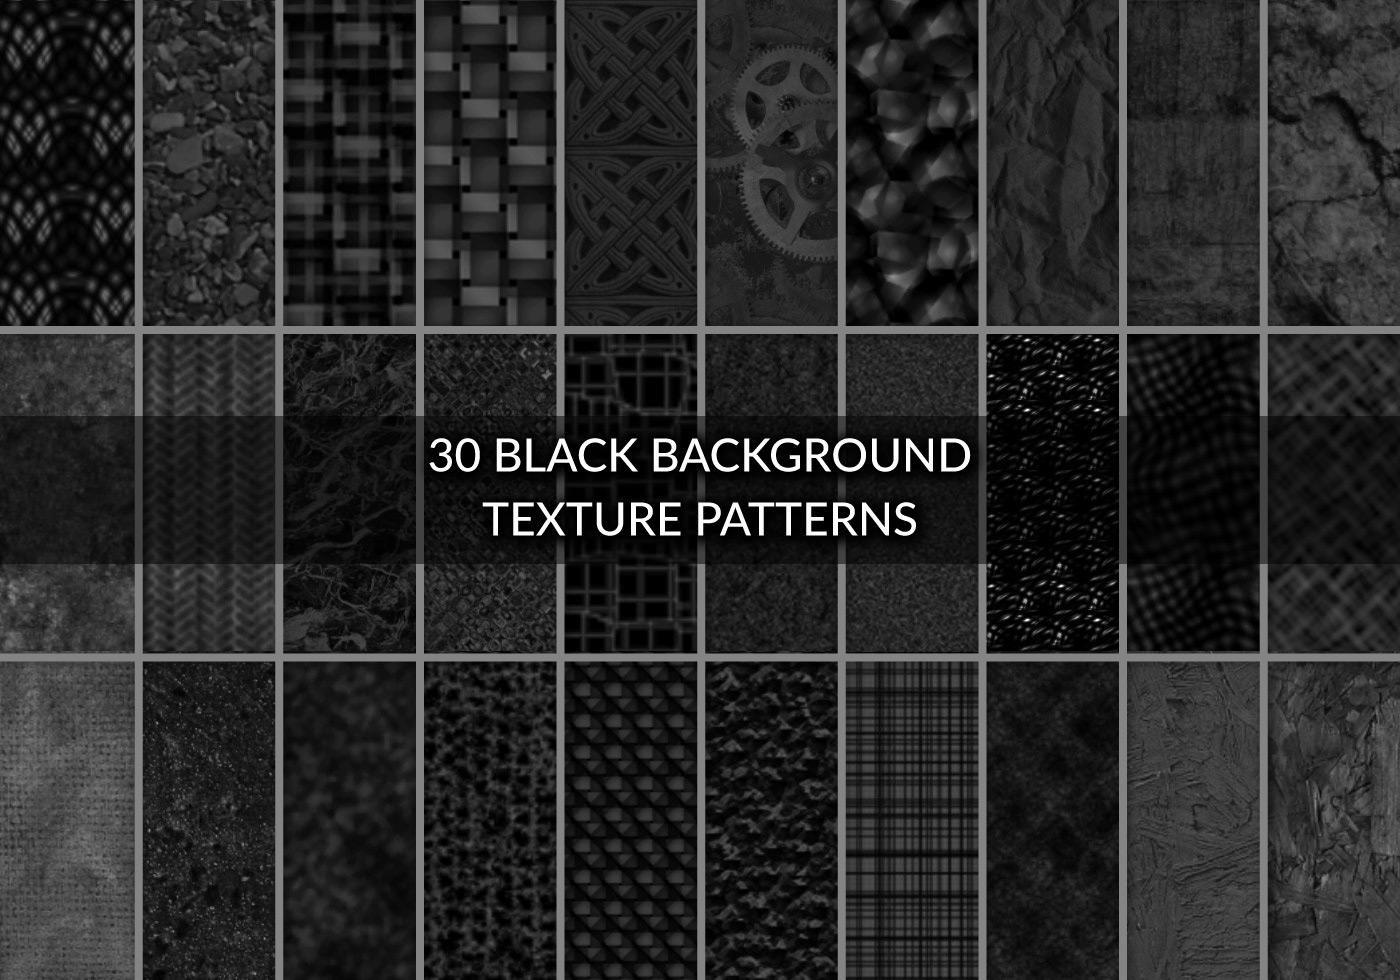 30 black background texture patterns free photoshop